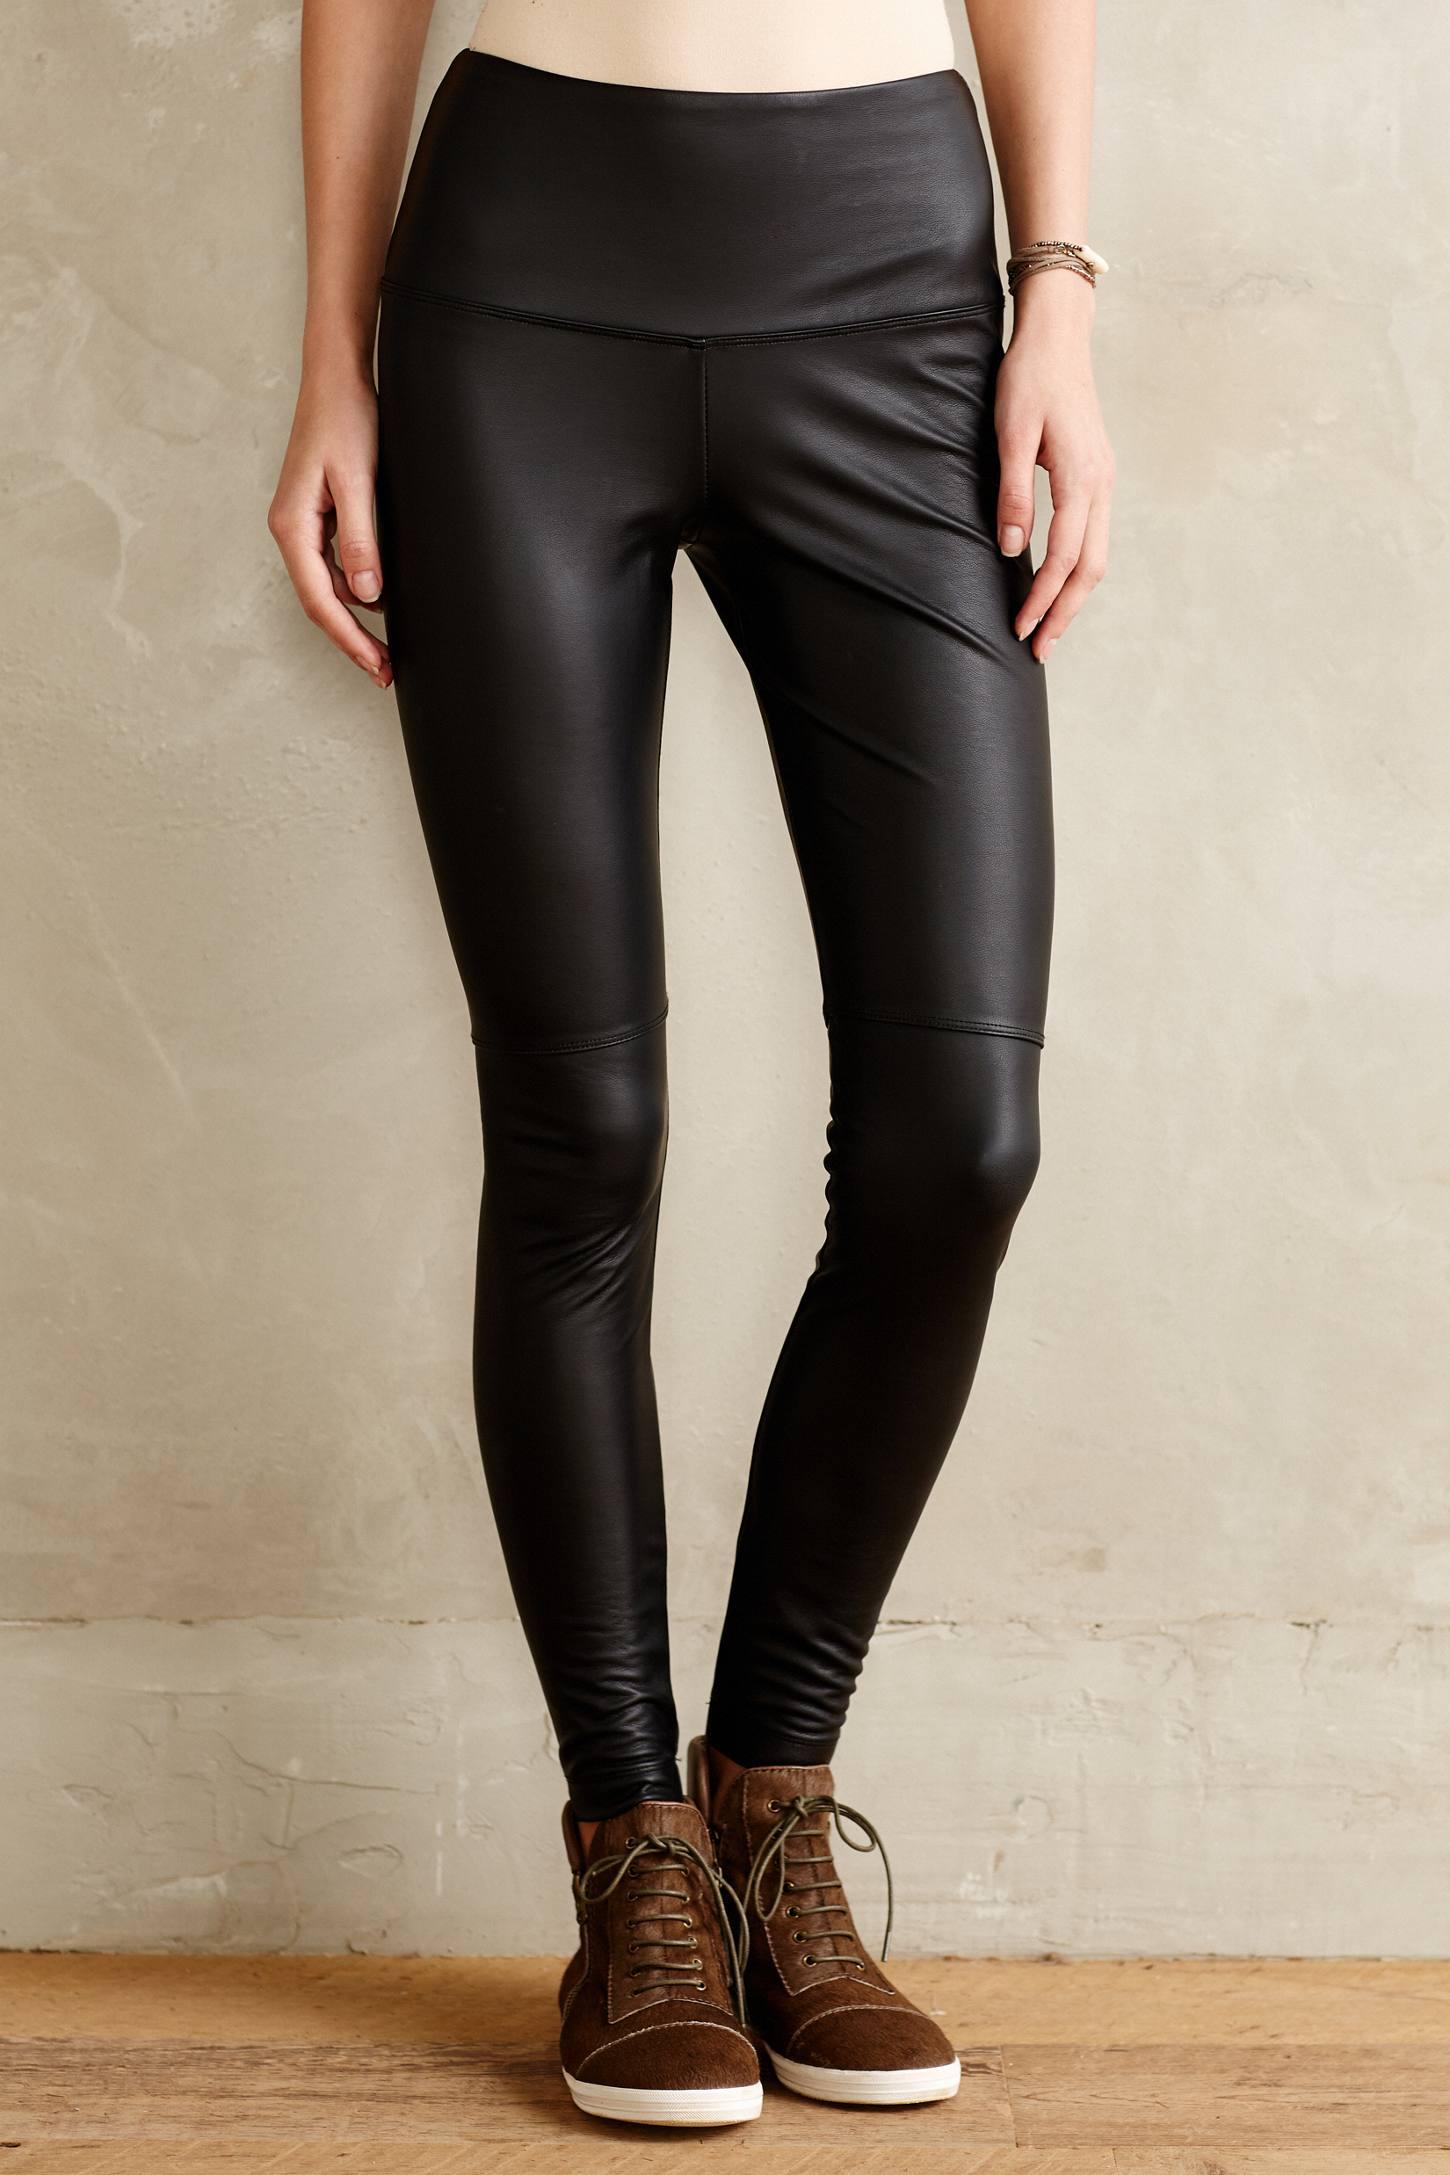 Lyssé Seamed Vegan Leather Leggings in Black | Lyst